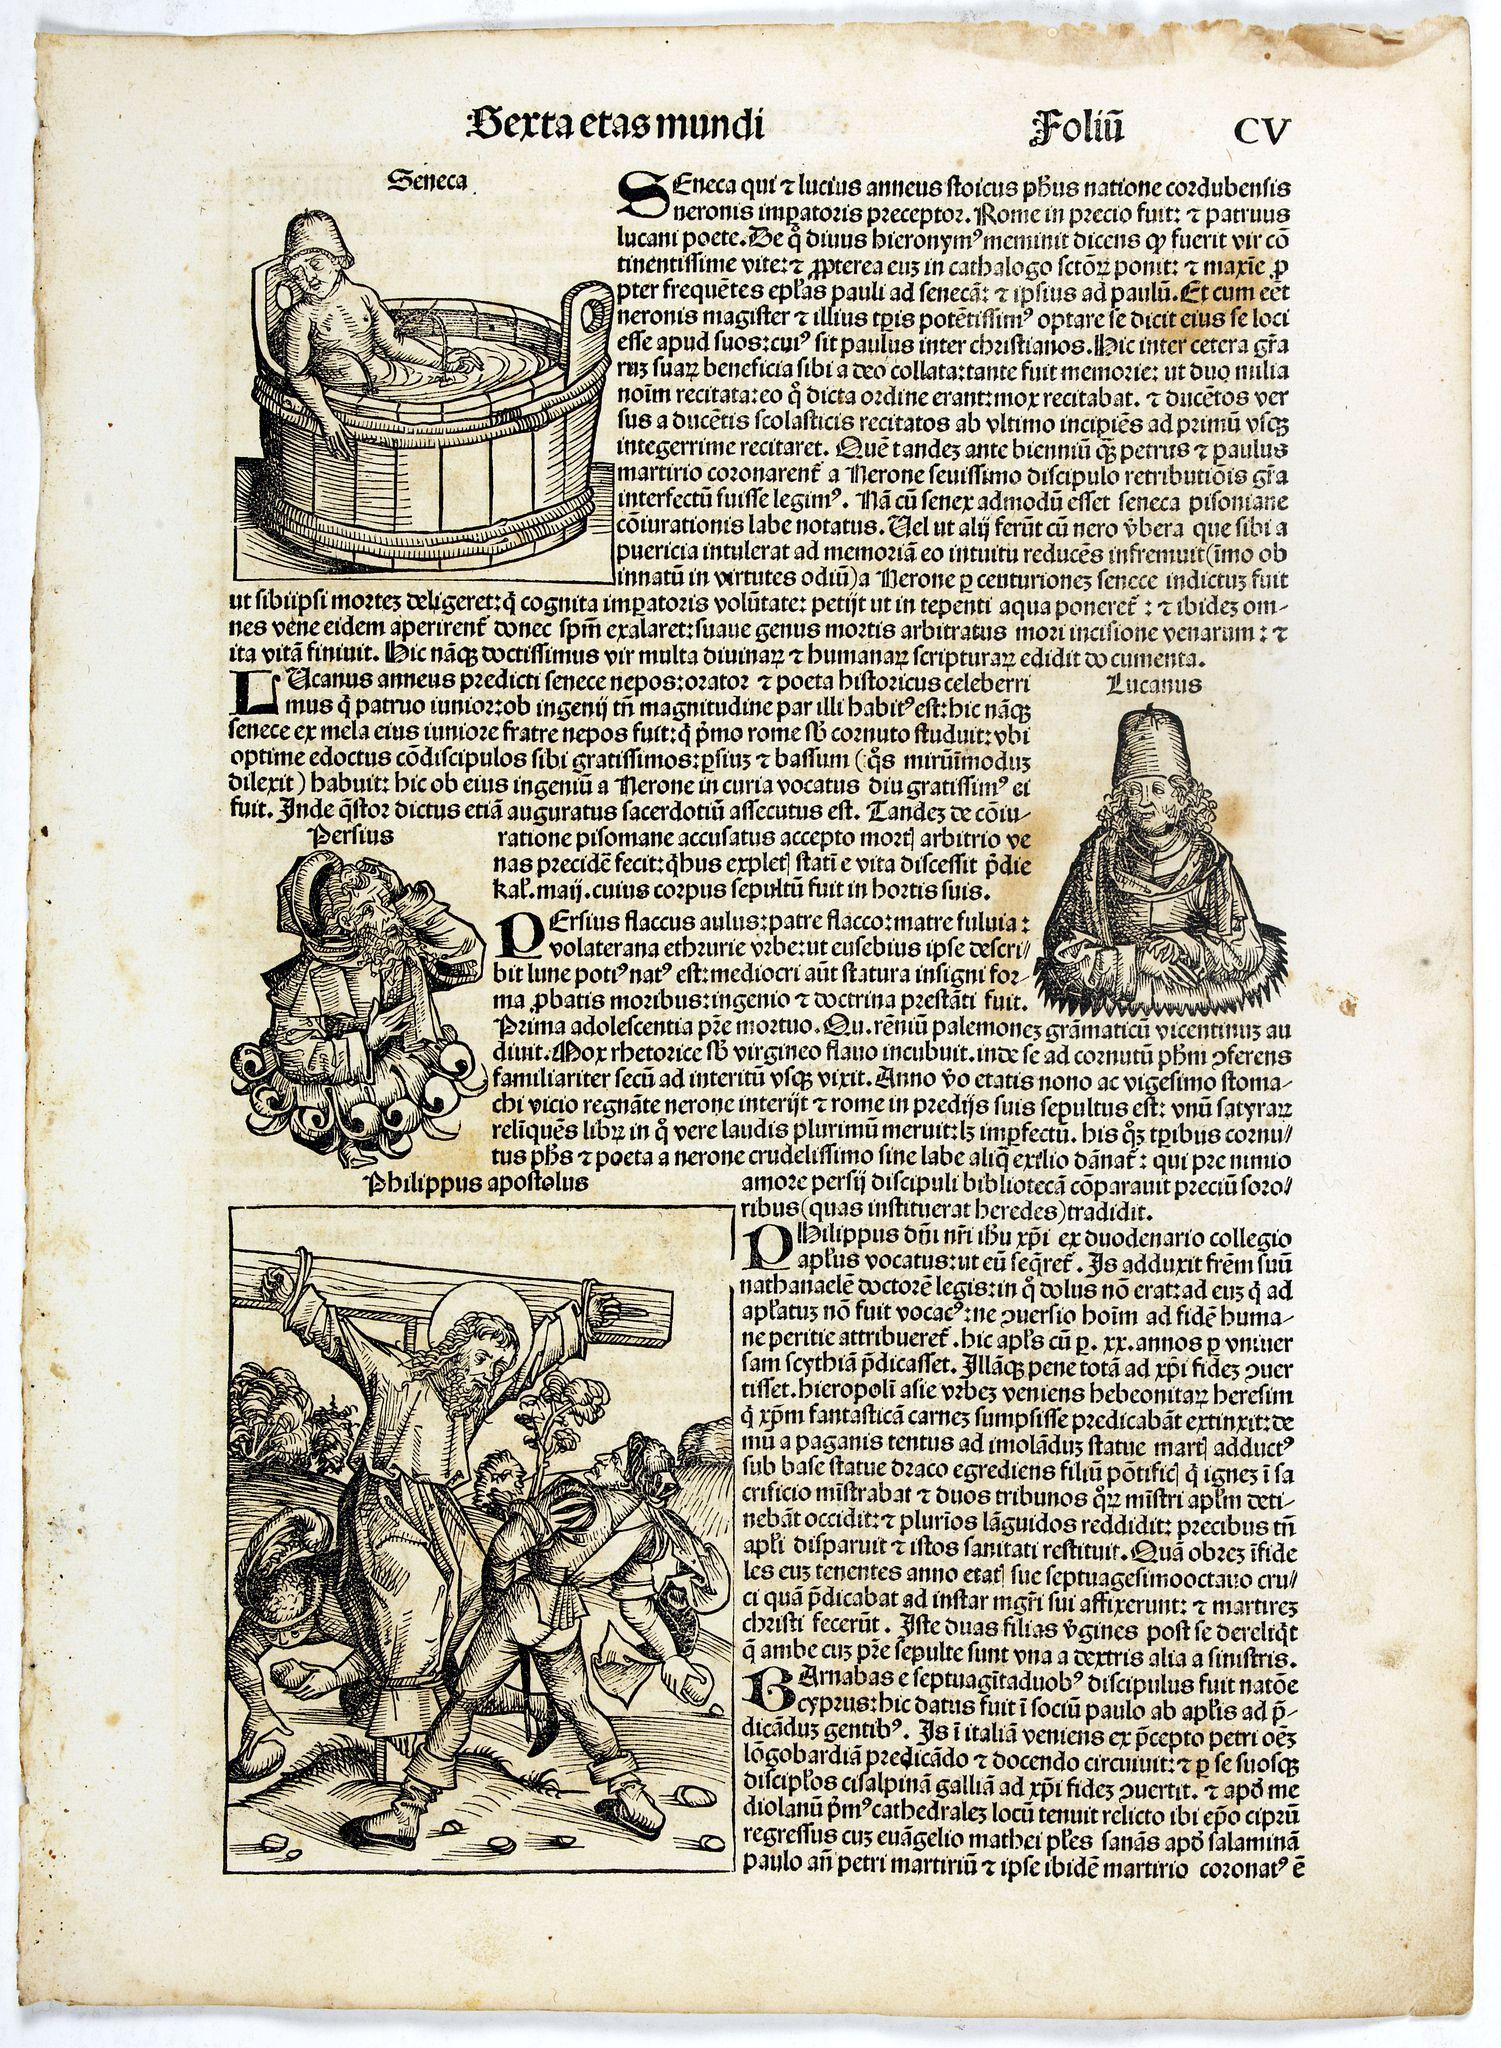 SCHEDEL, H. -  Sexta Etas Mundi. Folio CV.